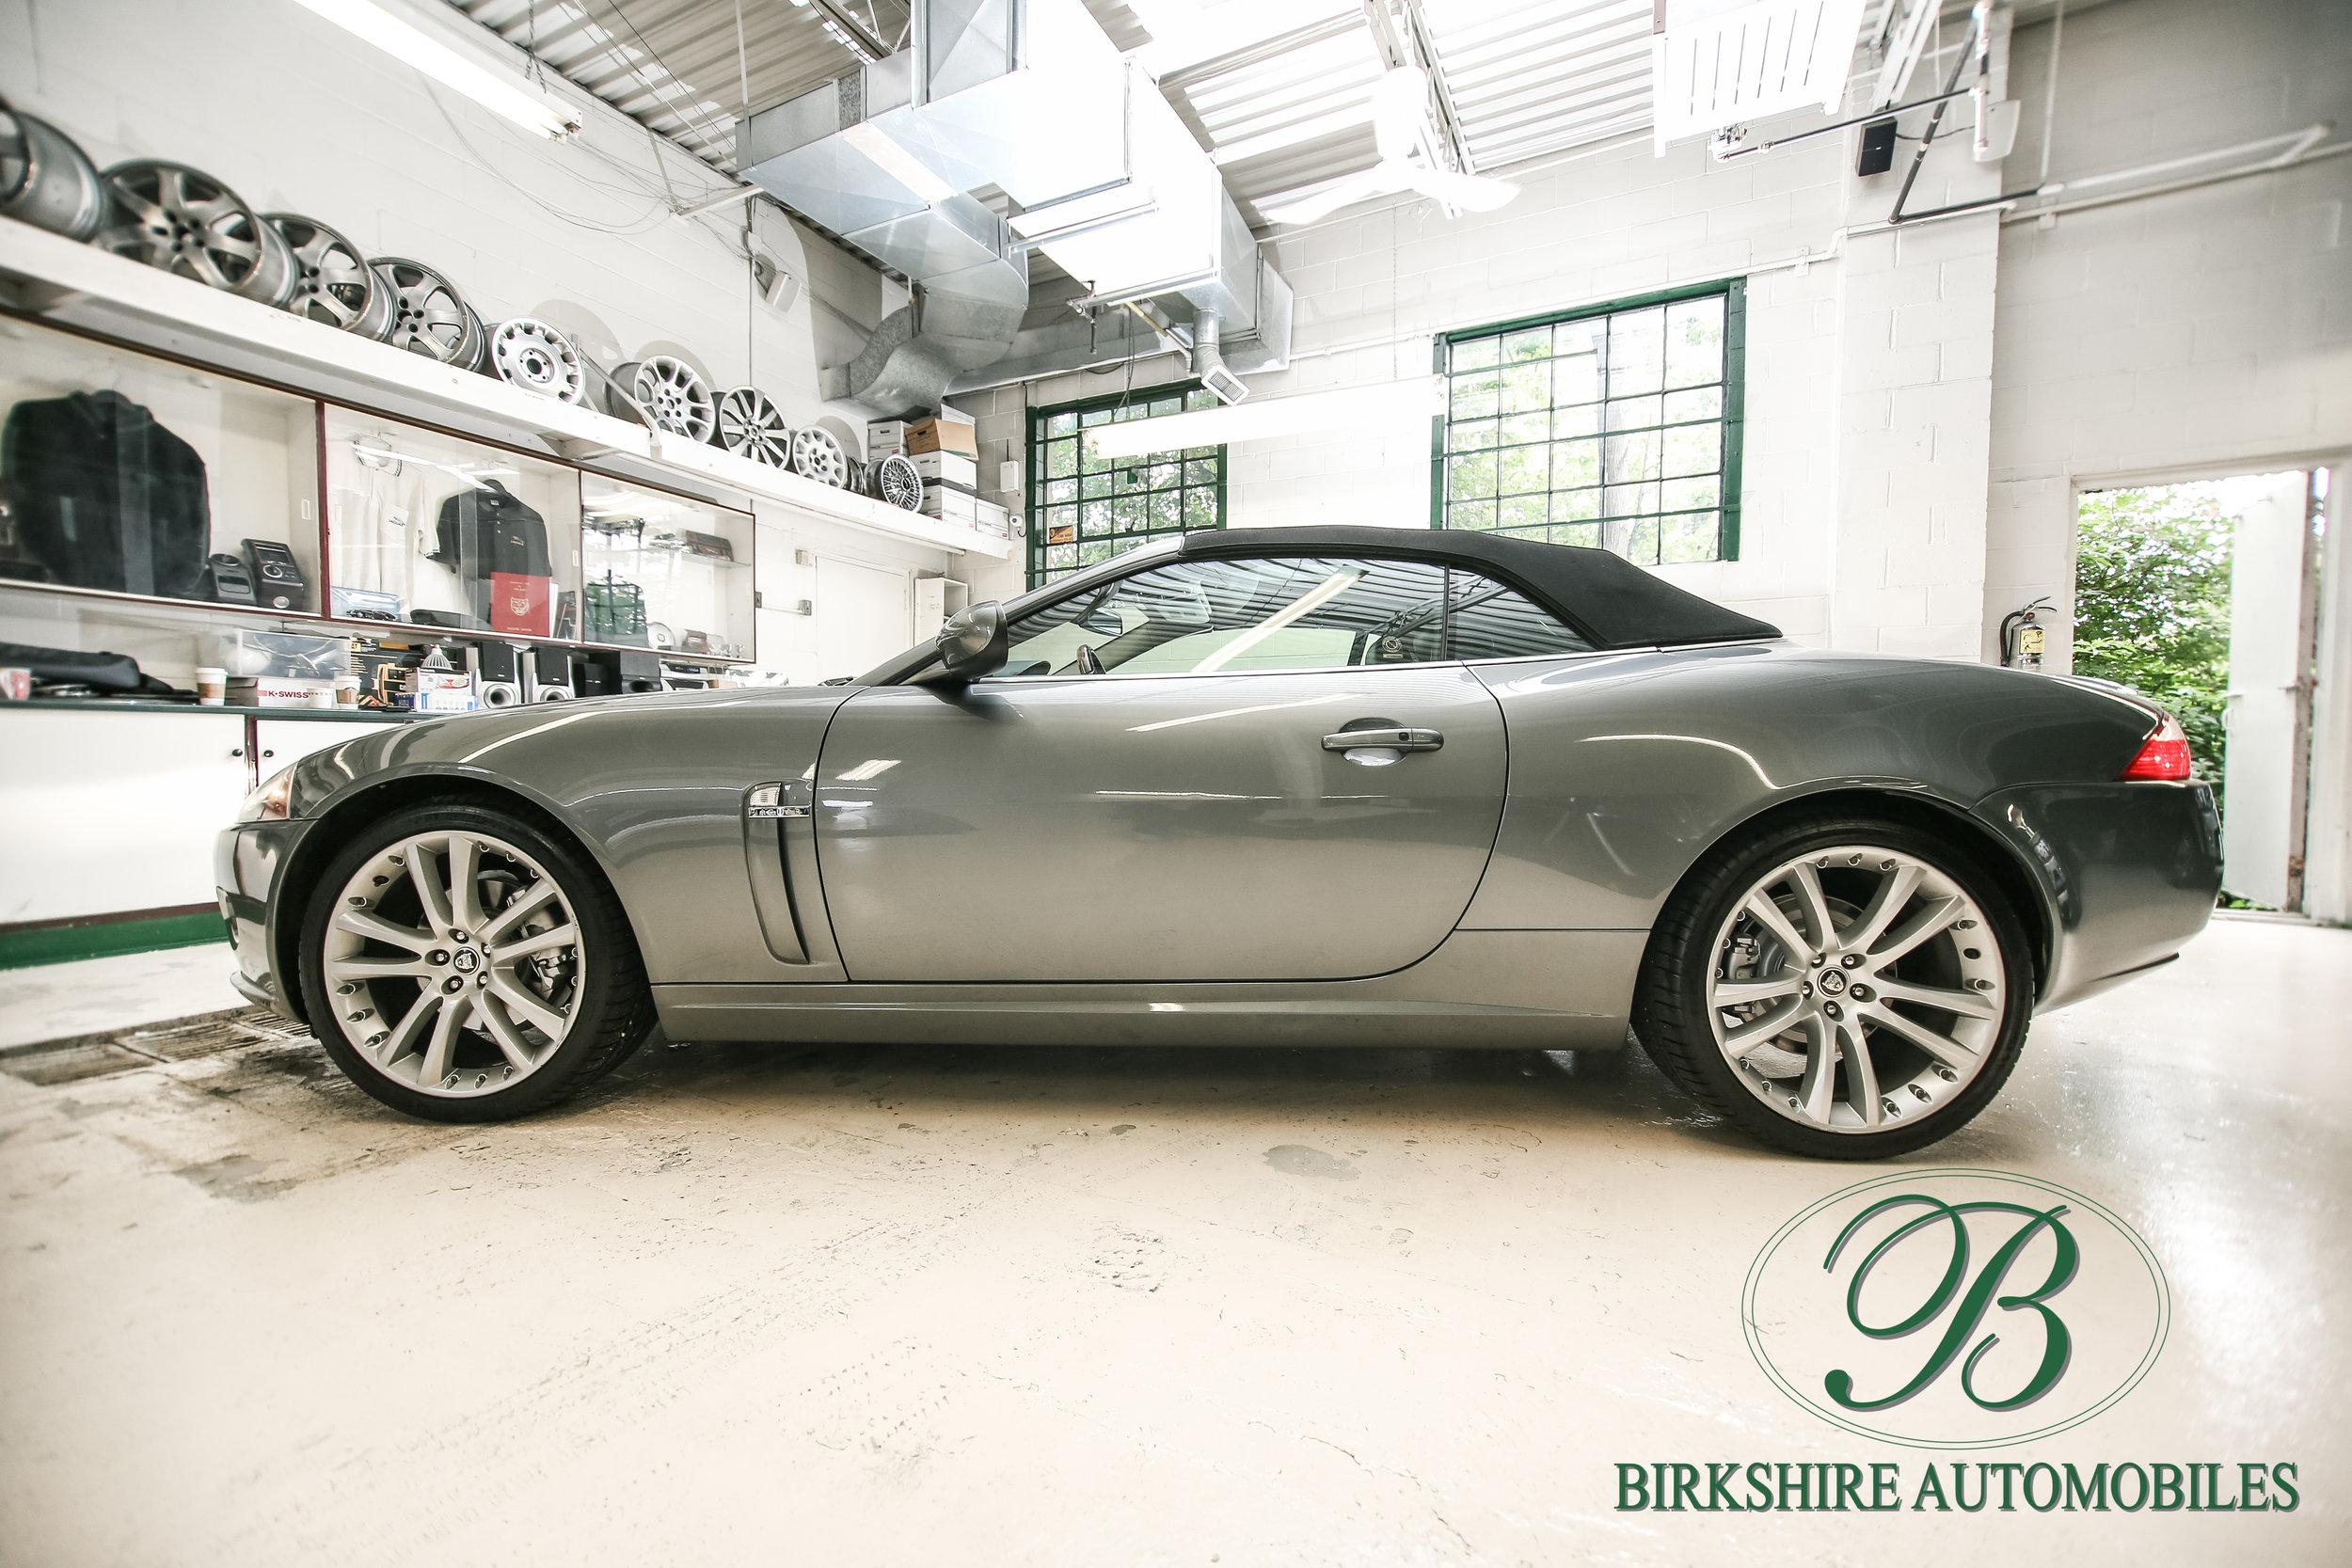 Birkshire Automobiles-158.jpg